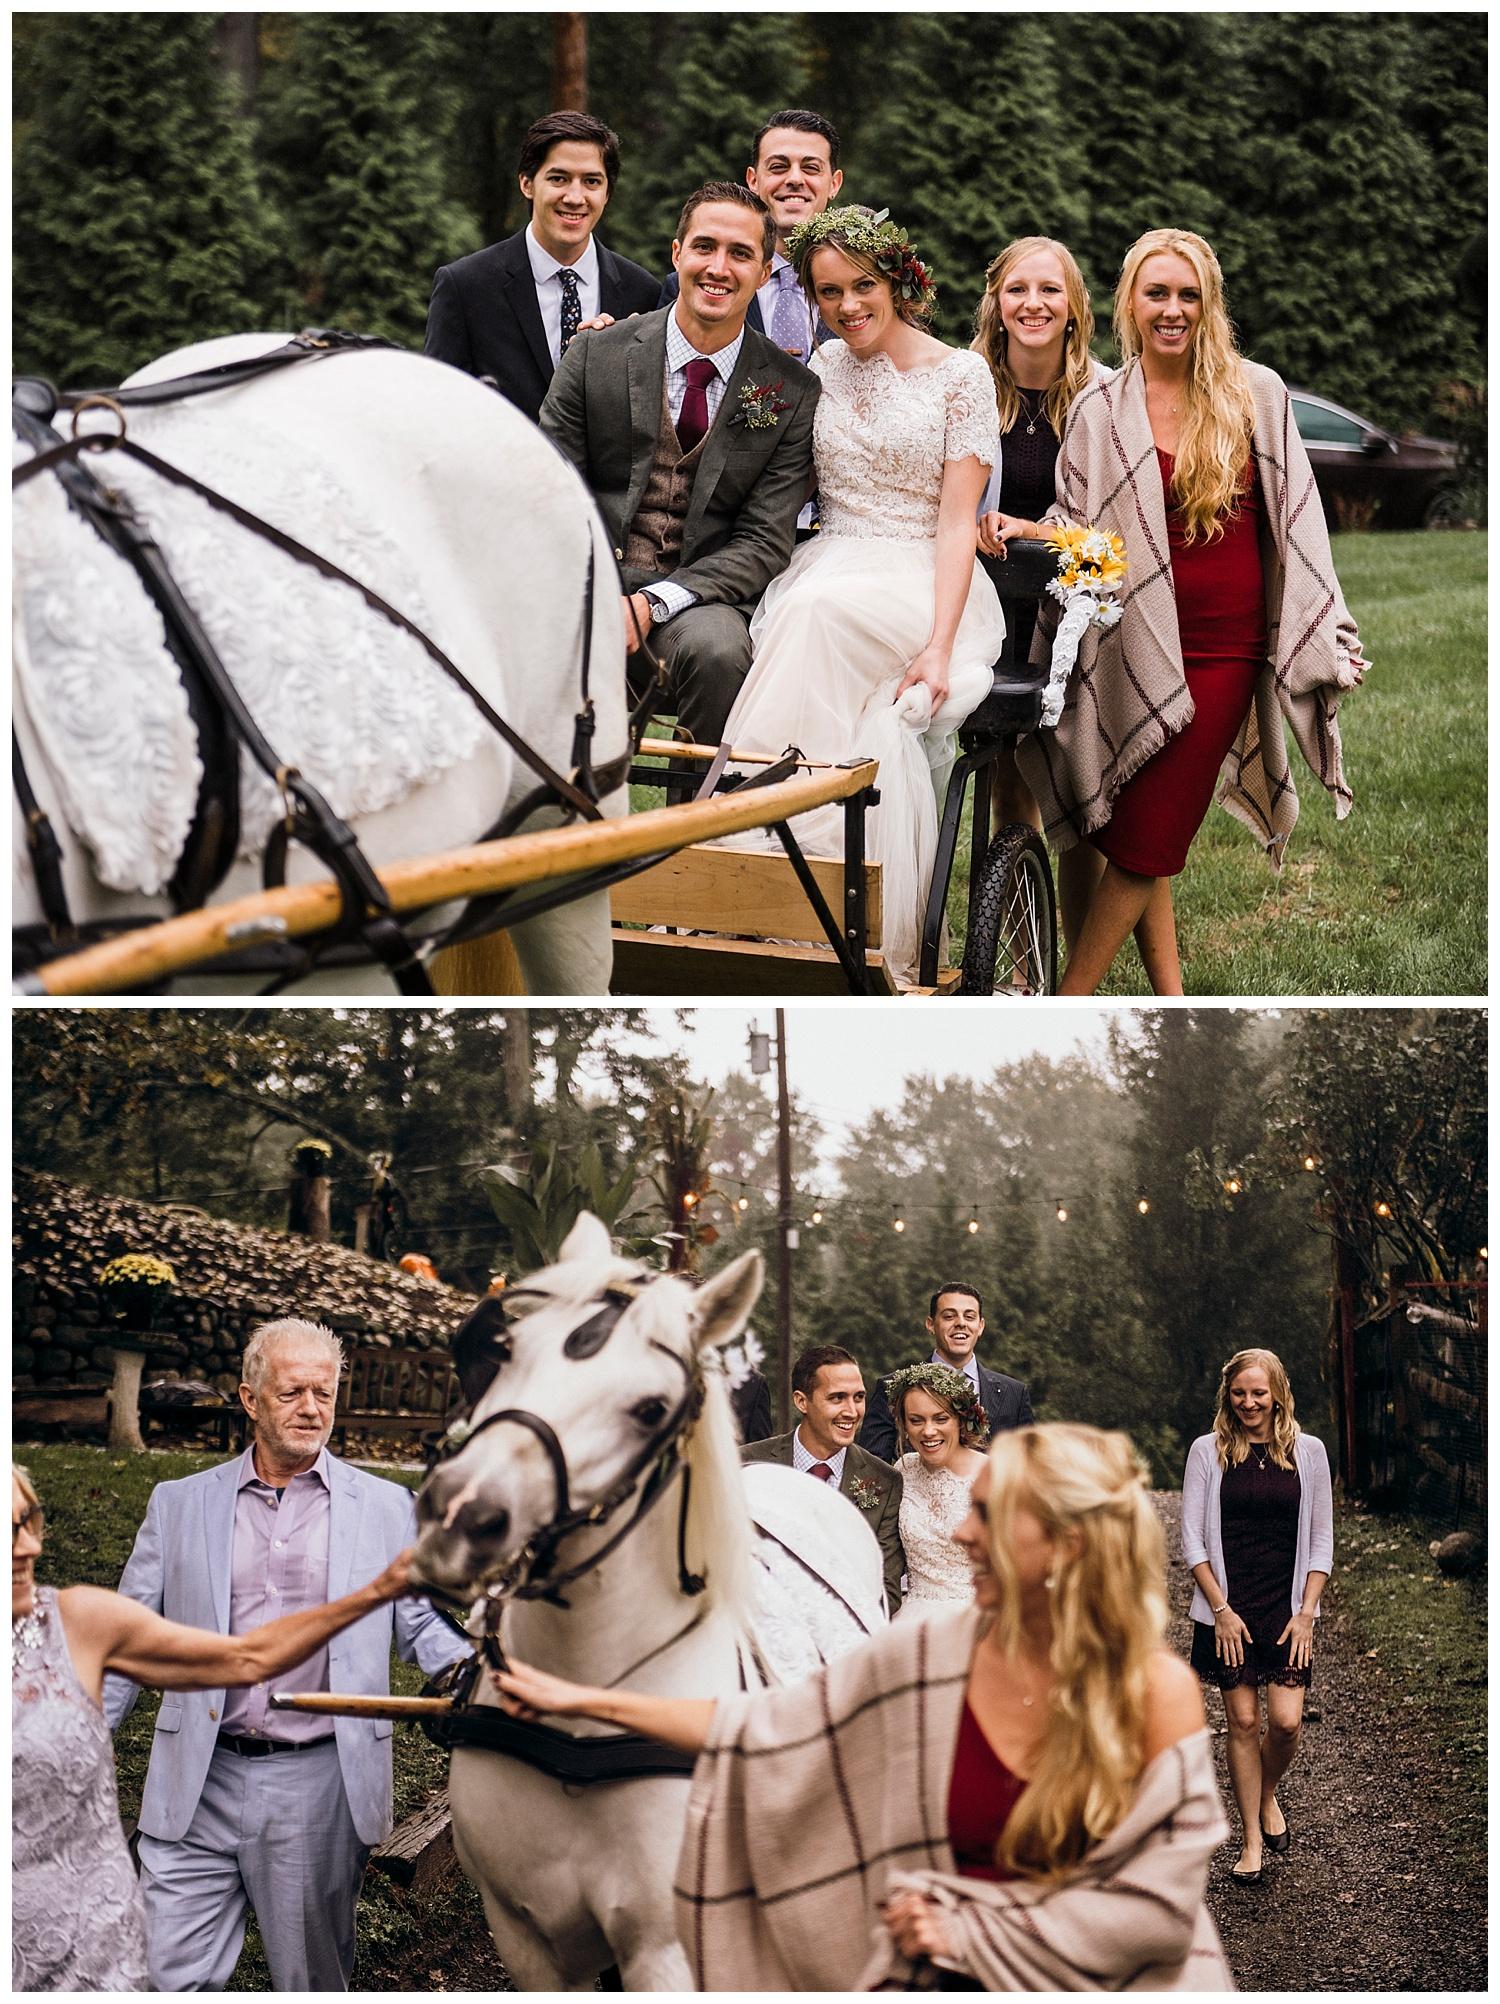 Huie_Wedding_Apollo_Fields_Ramsey_NJ_039.jpg